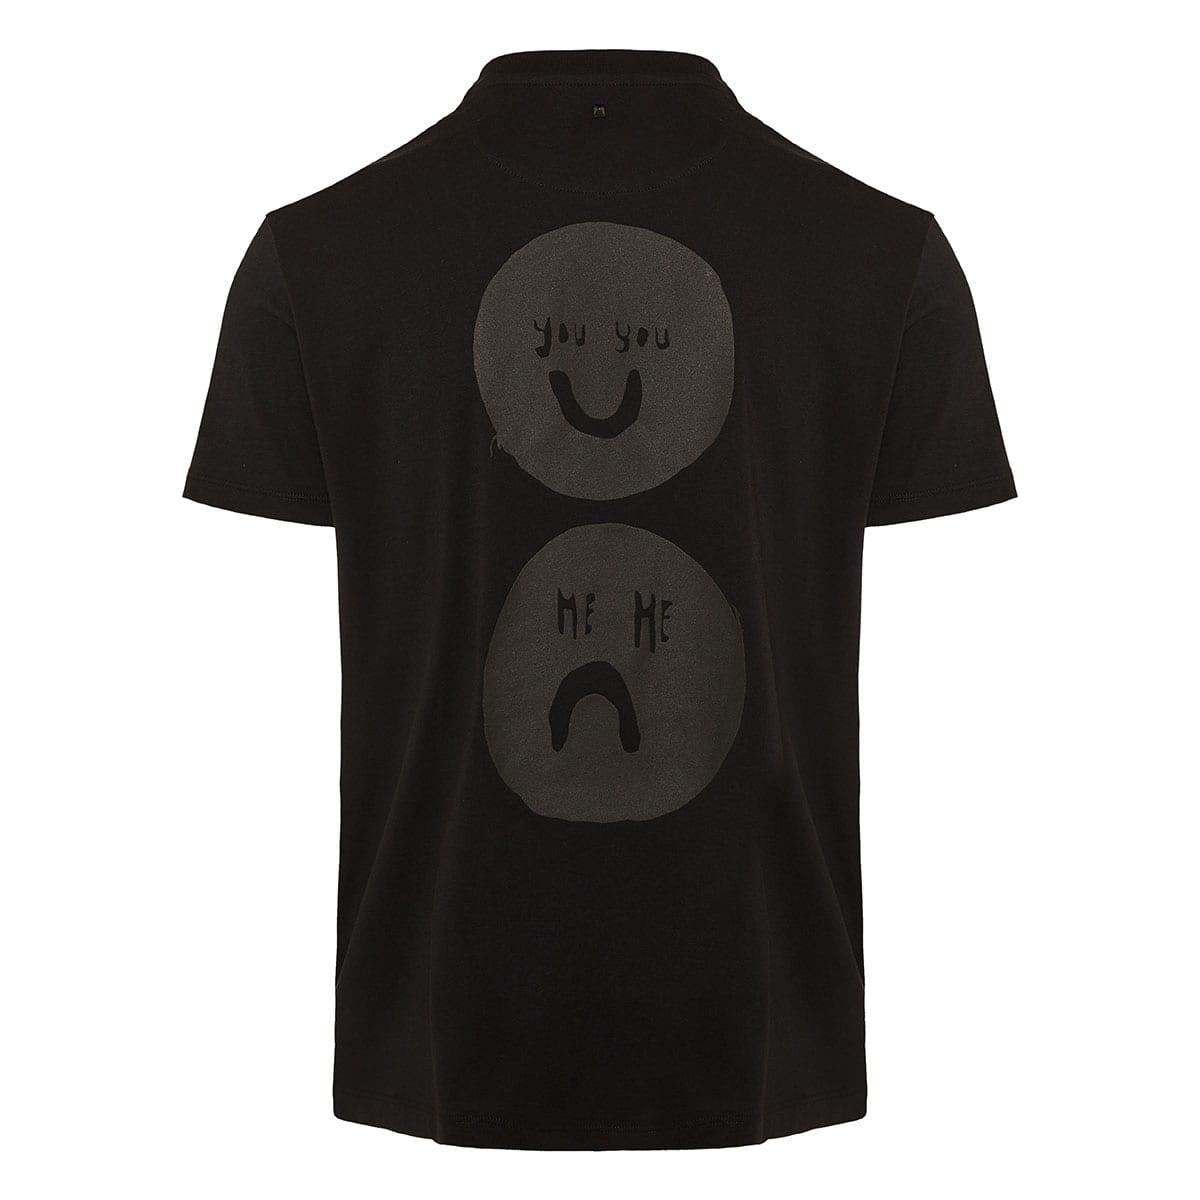 Want Want t-shirt